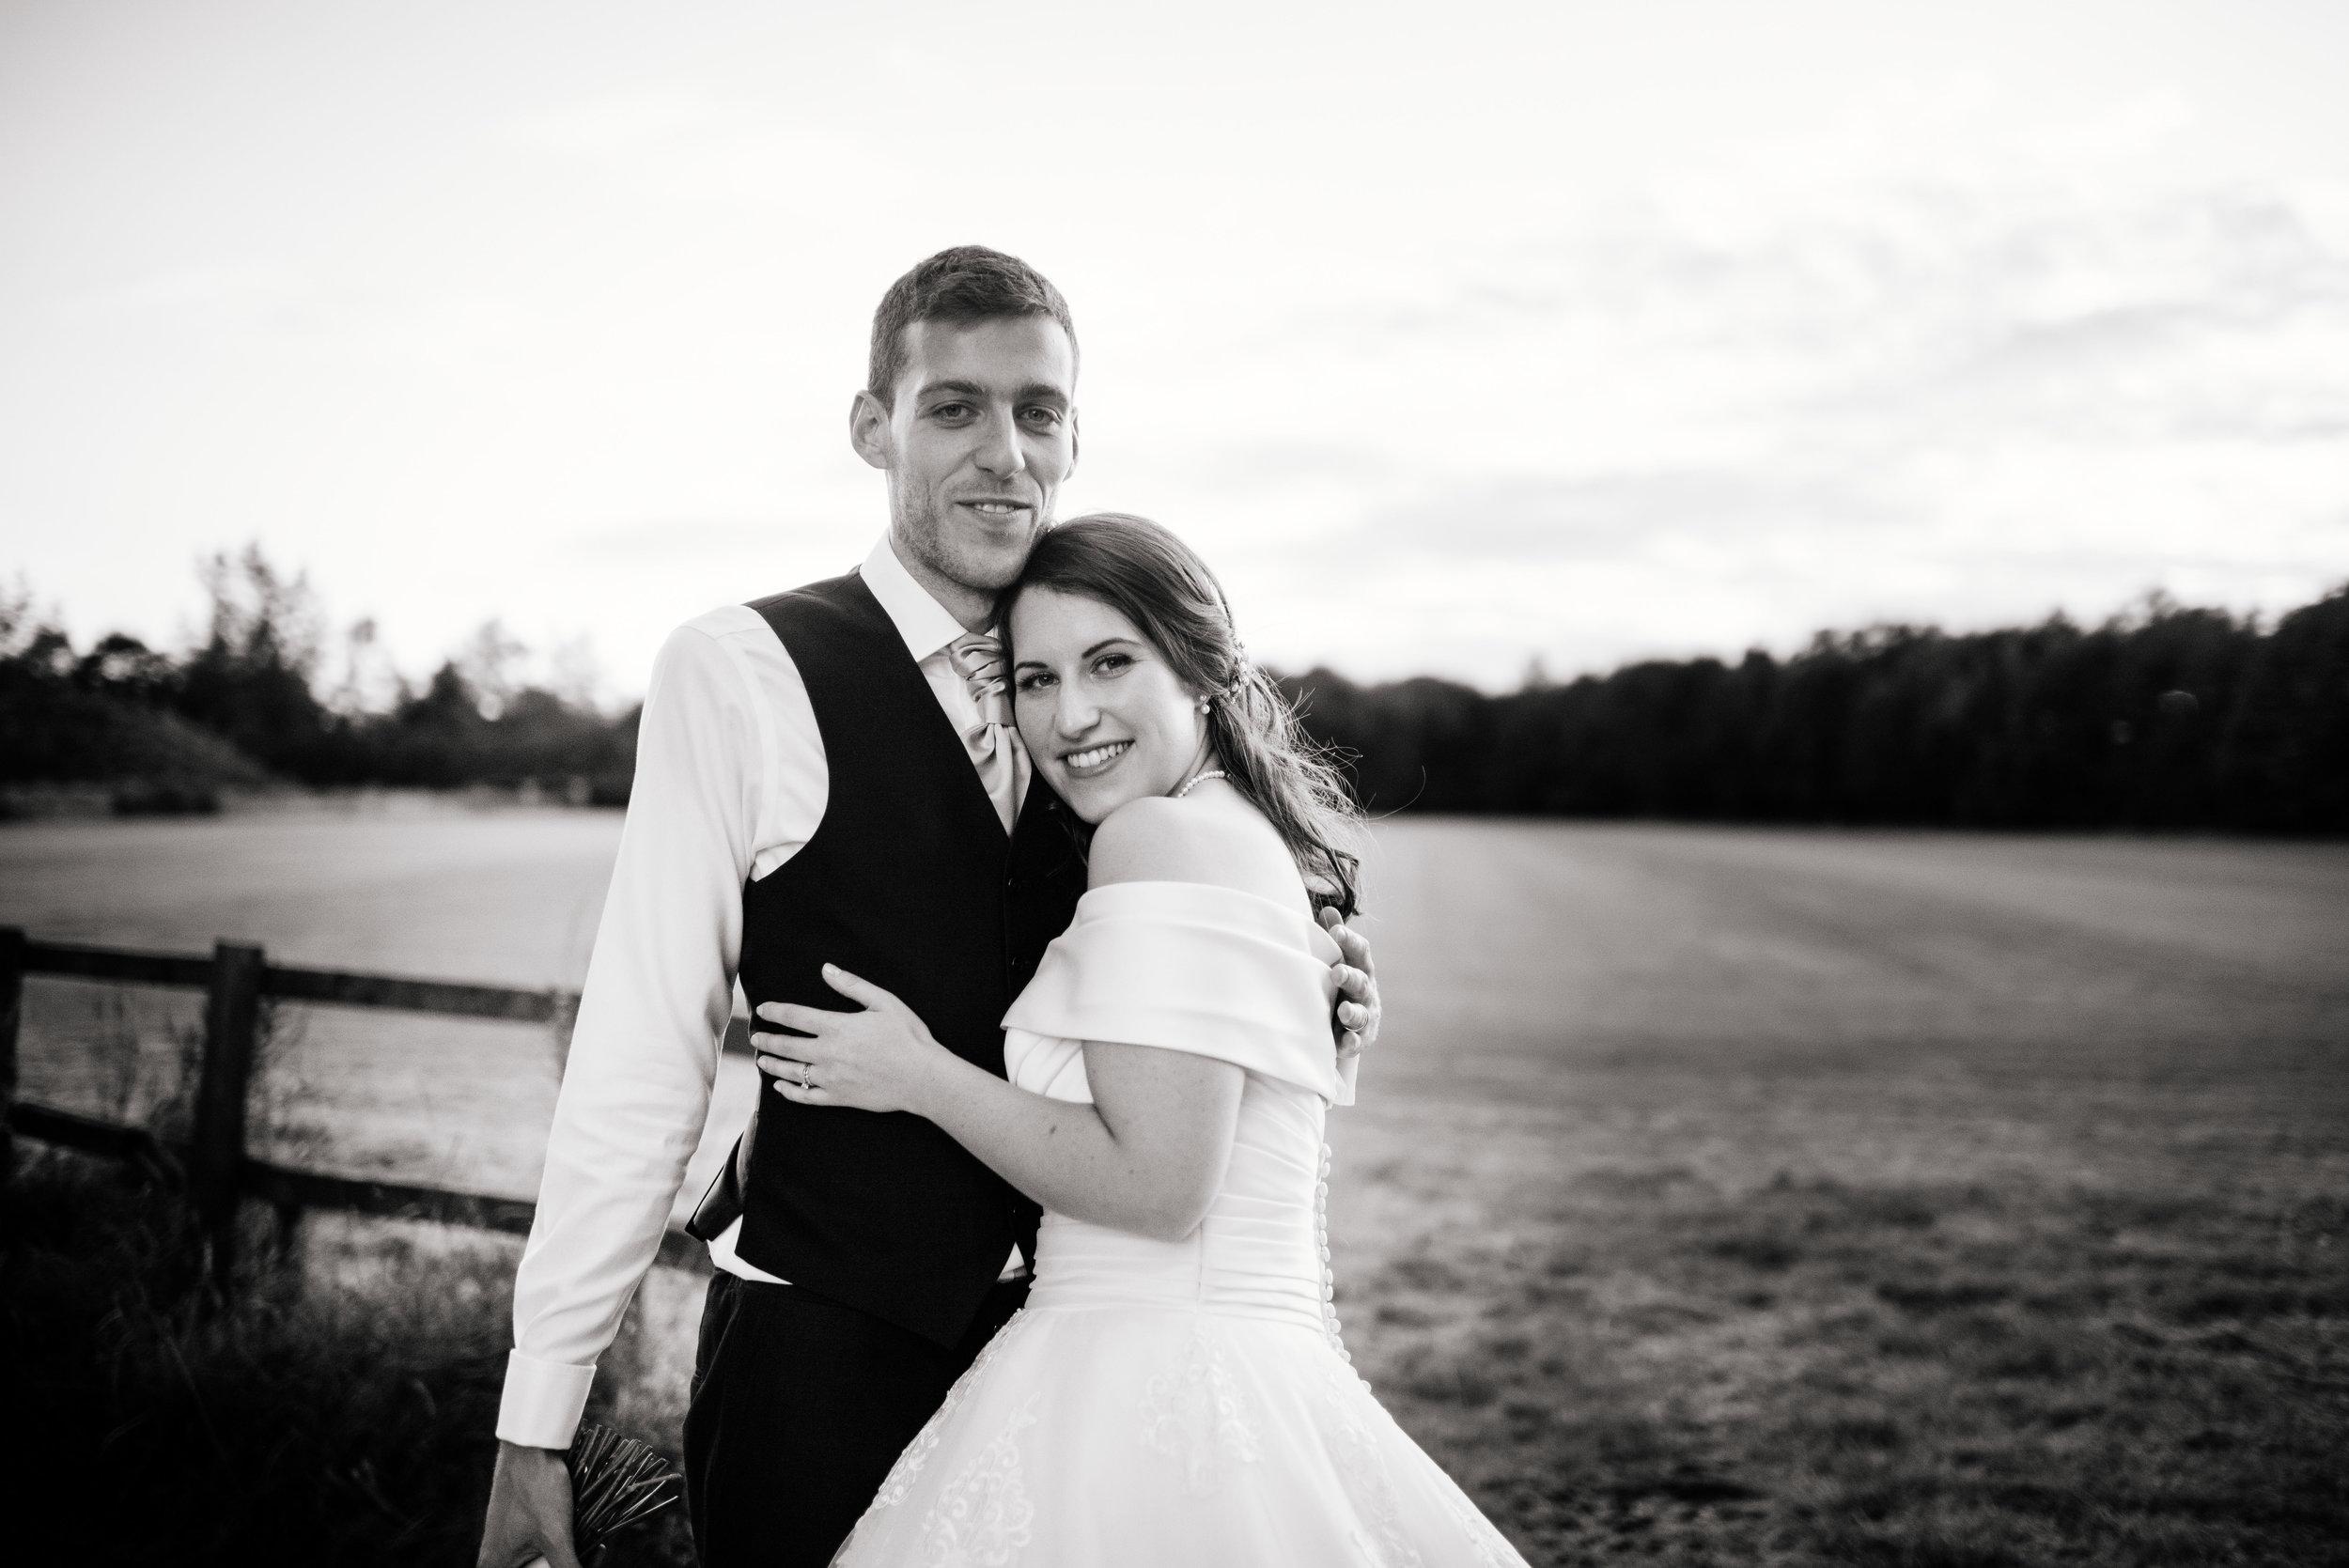 31 Lillibrooke Manor Berkshire Bride Groom Portrait Wedding Photography.jpg